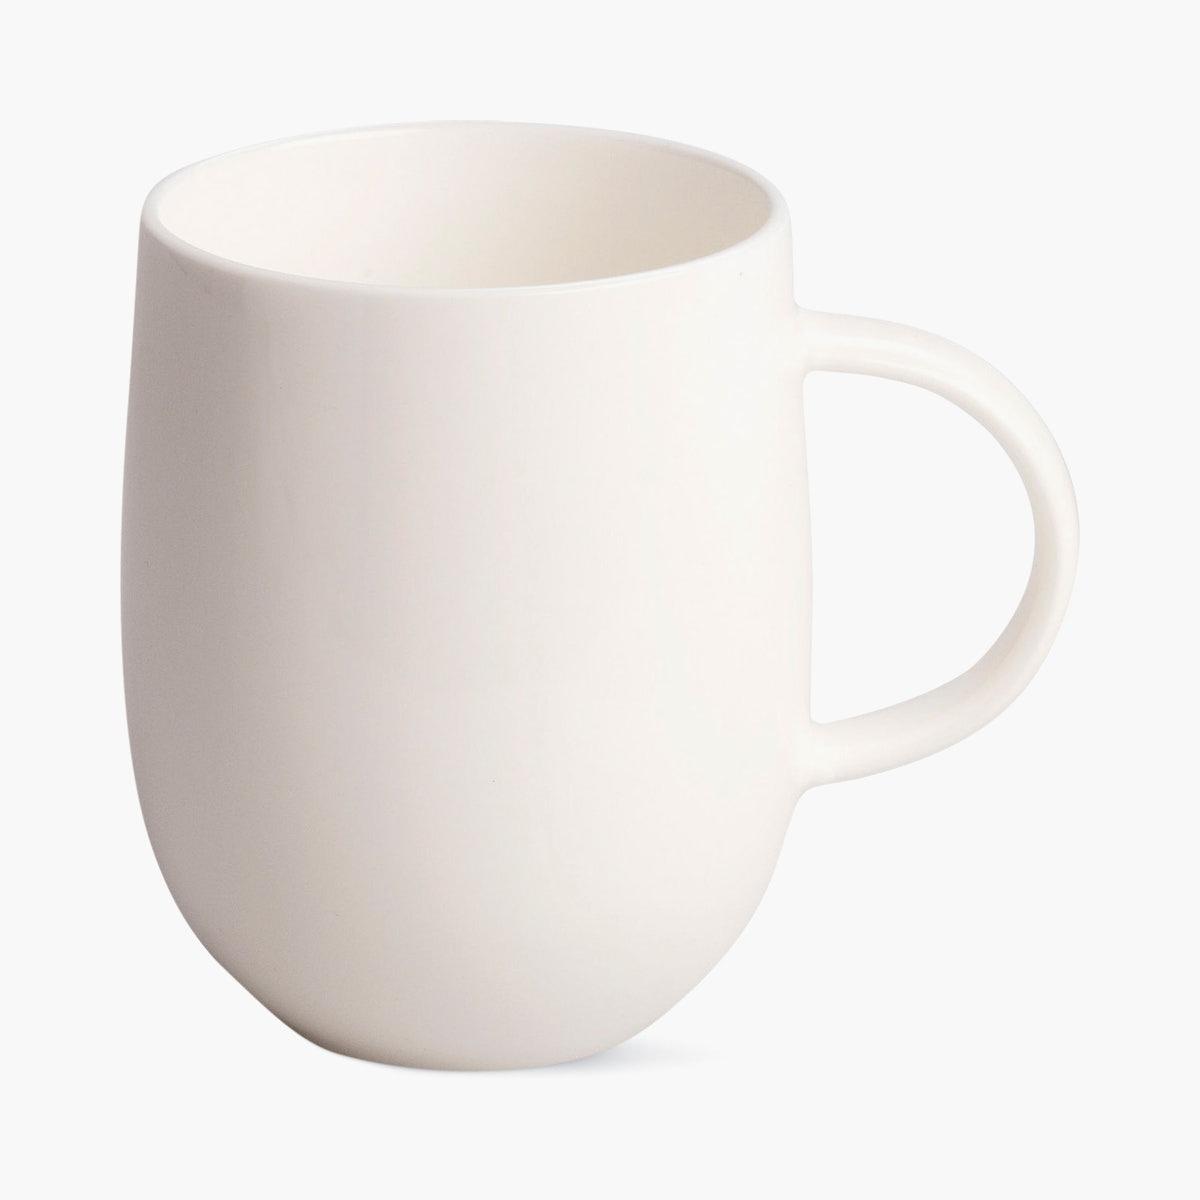 All-Time Mugs, Set of 4